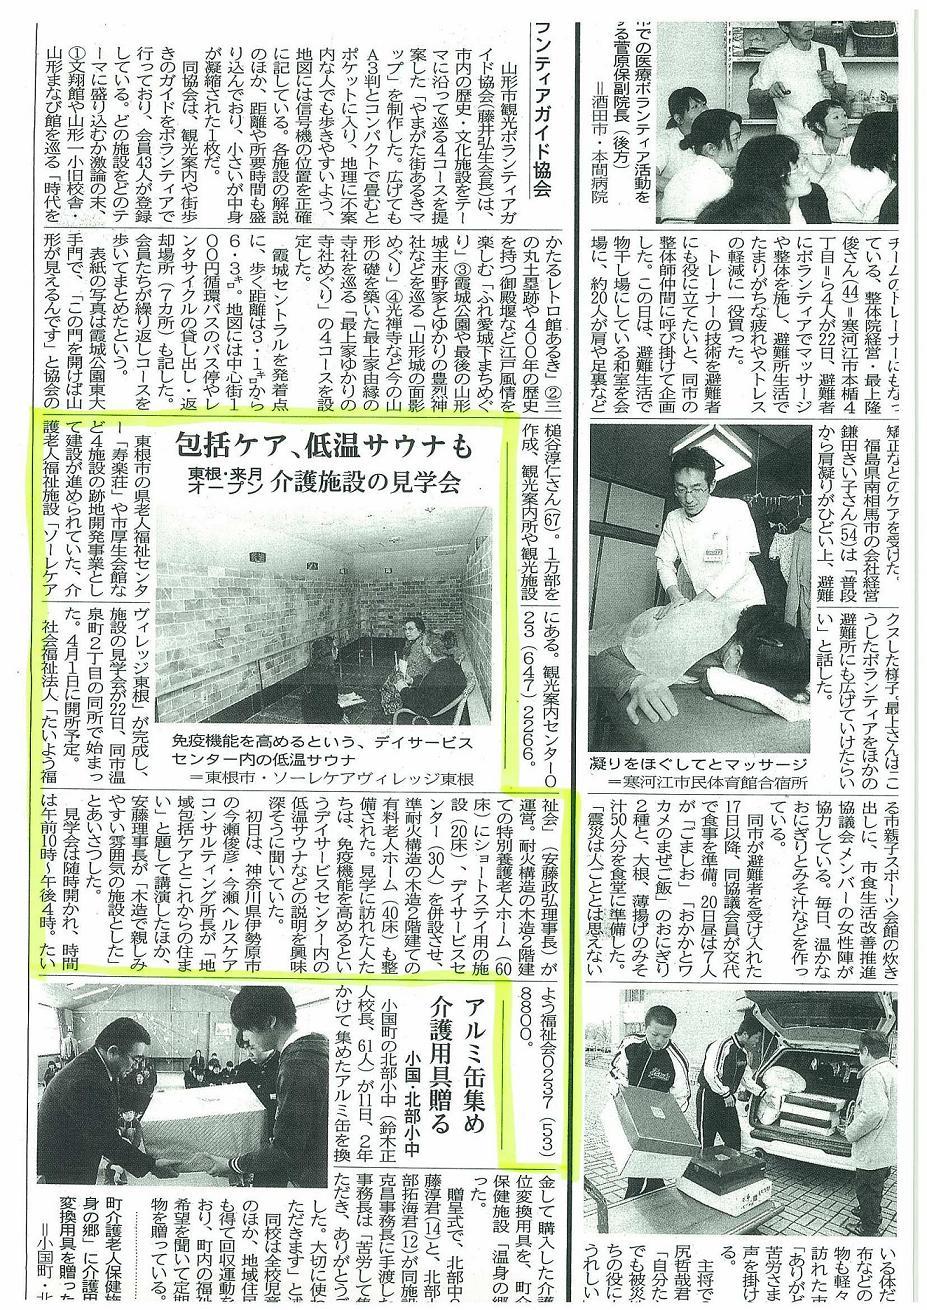 scan-4-2.jpg